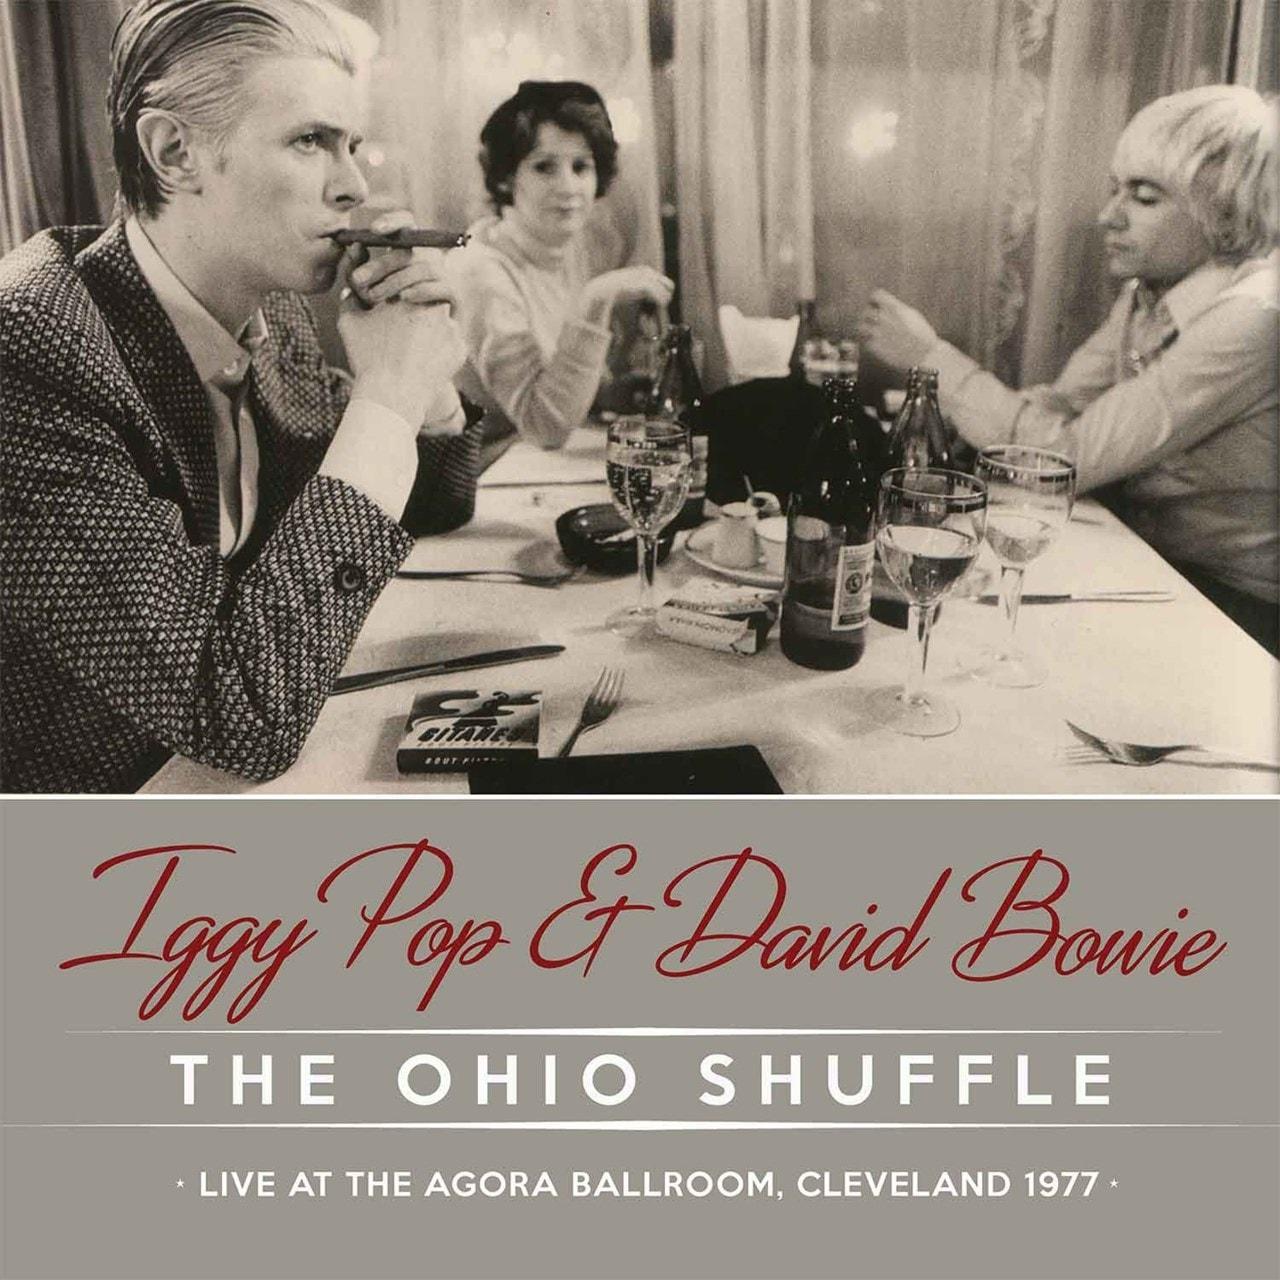 The Ohio Shuffle: Live at the Agora Ballroom, Cleveland 1977 - 1